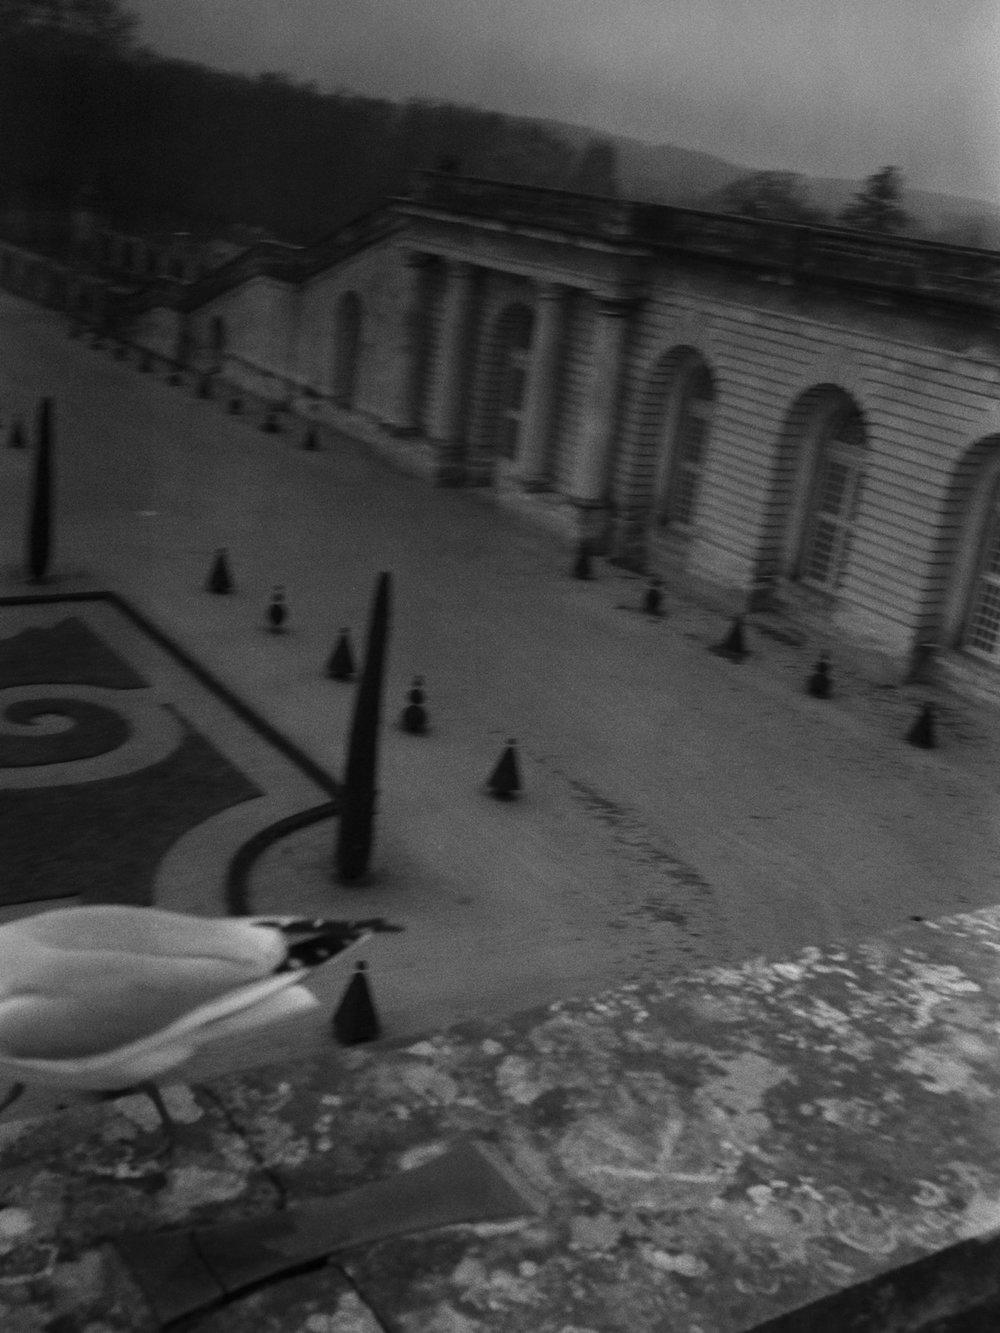 Paris-Matthew-Attard-Navarro-01.jpg